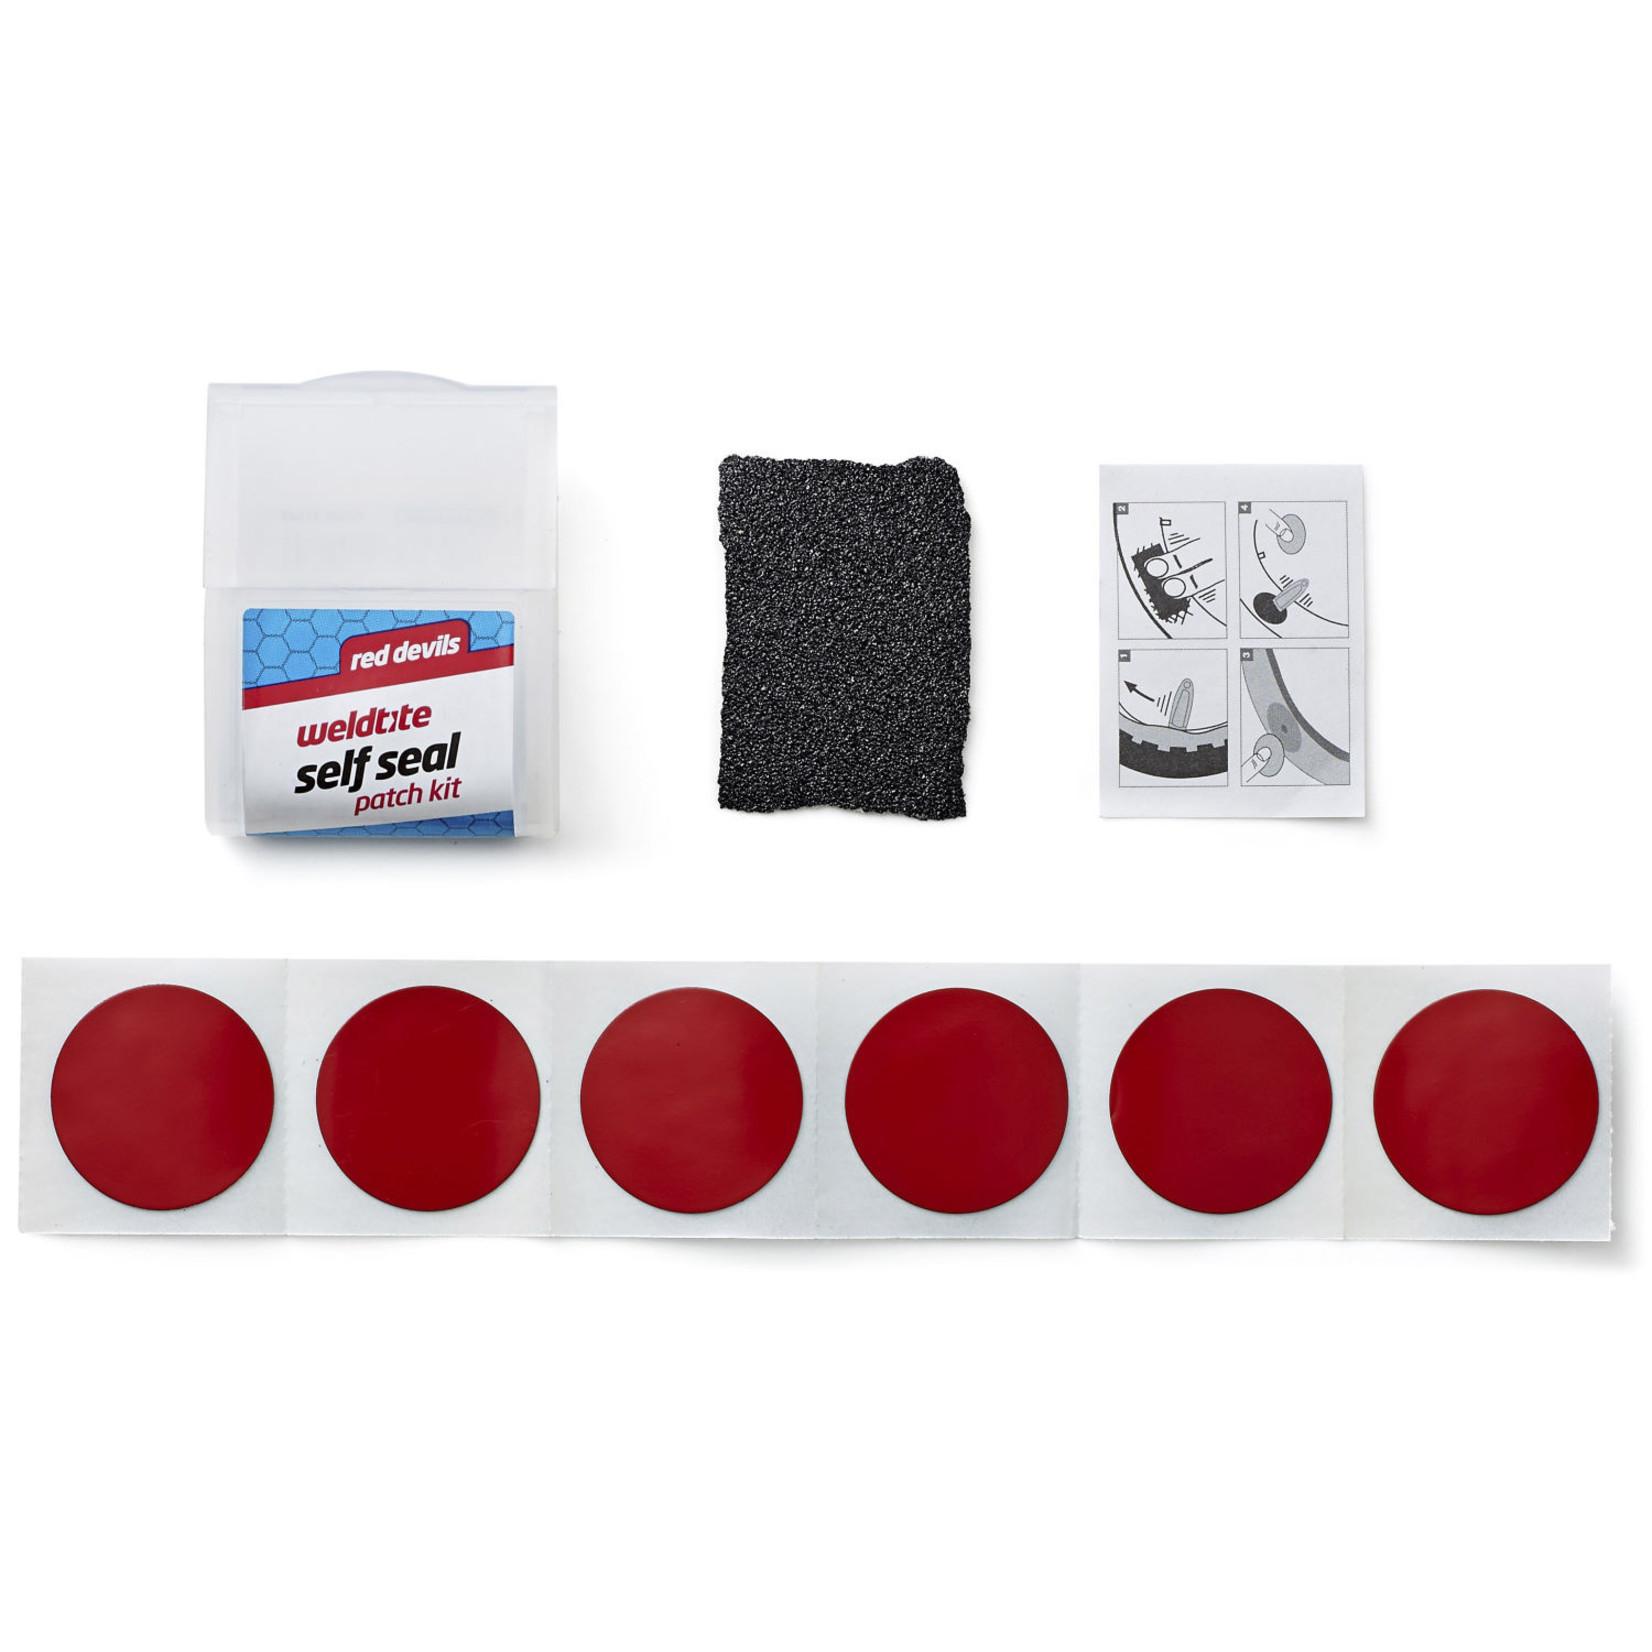 Weldtite Weldtite, Red Devils Self Seal Patch Kit